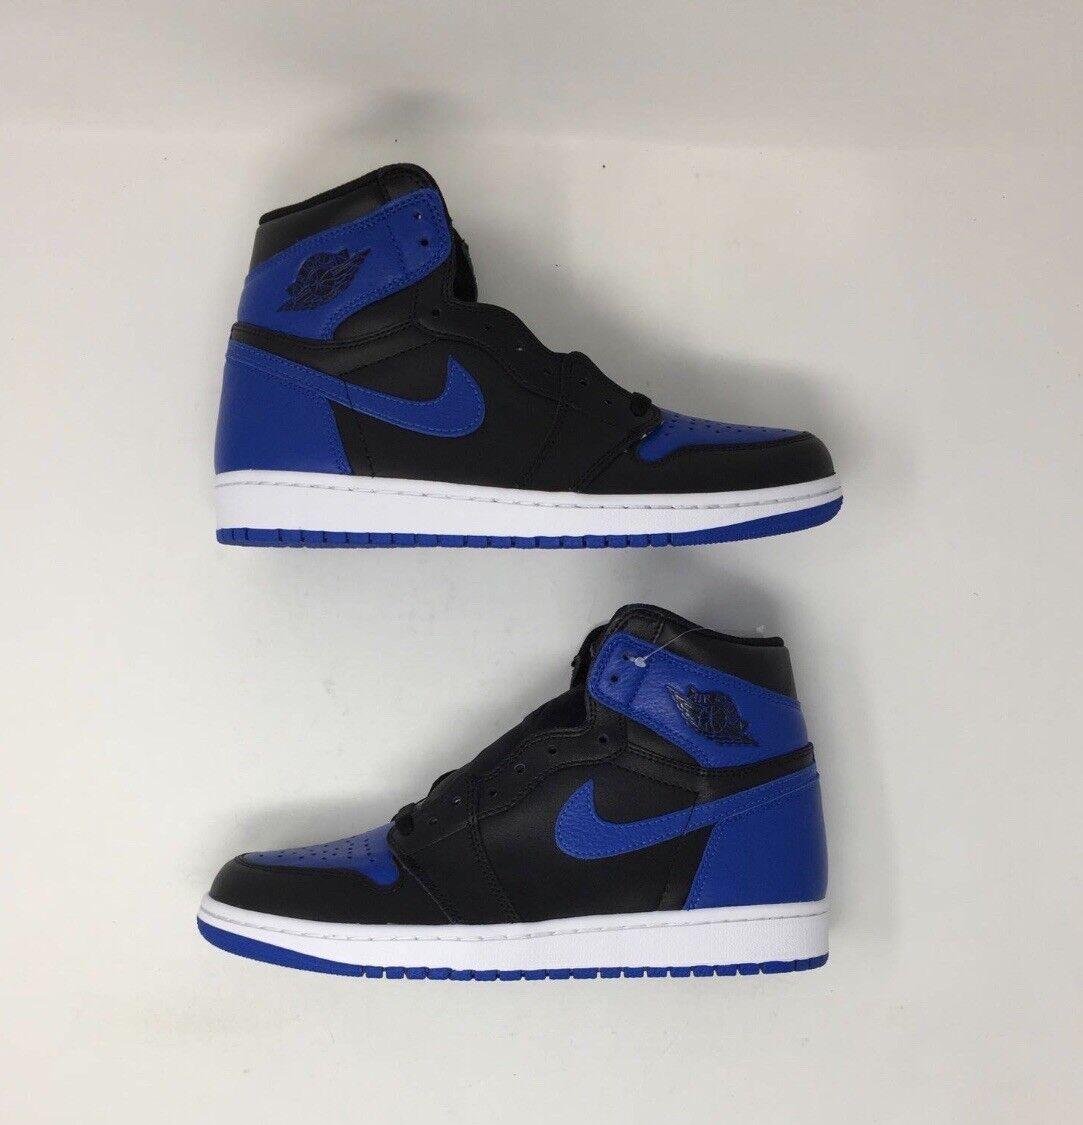 Nike Air Jordan 1 Retro High OG 555088-007